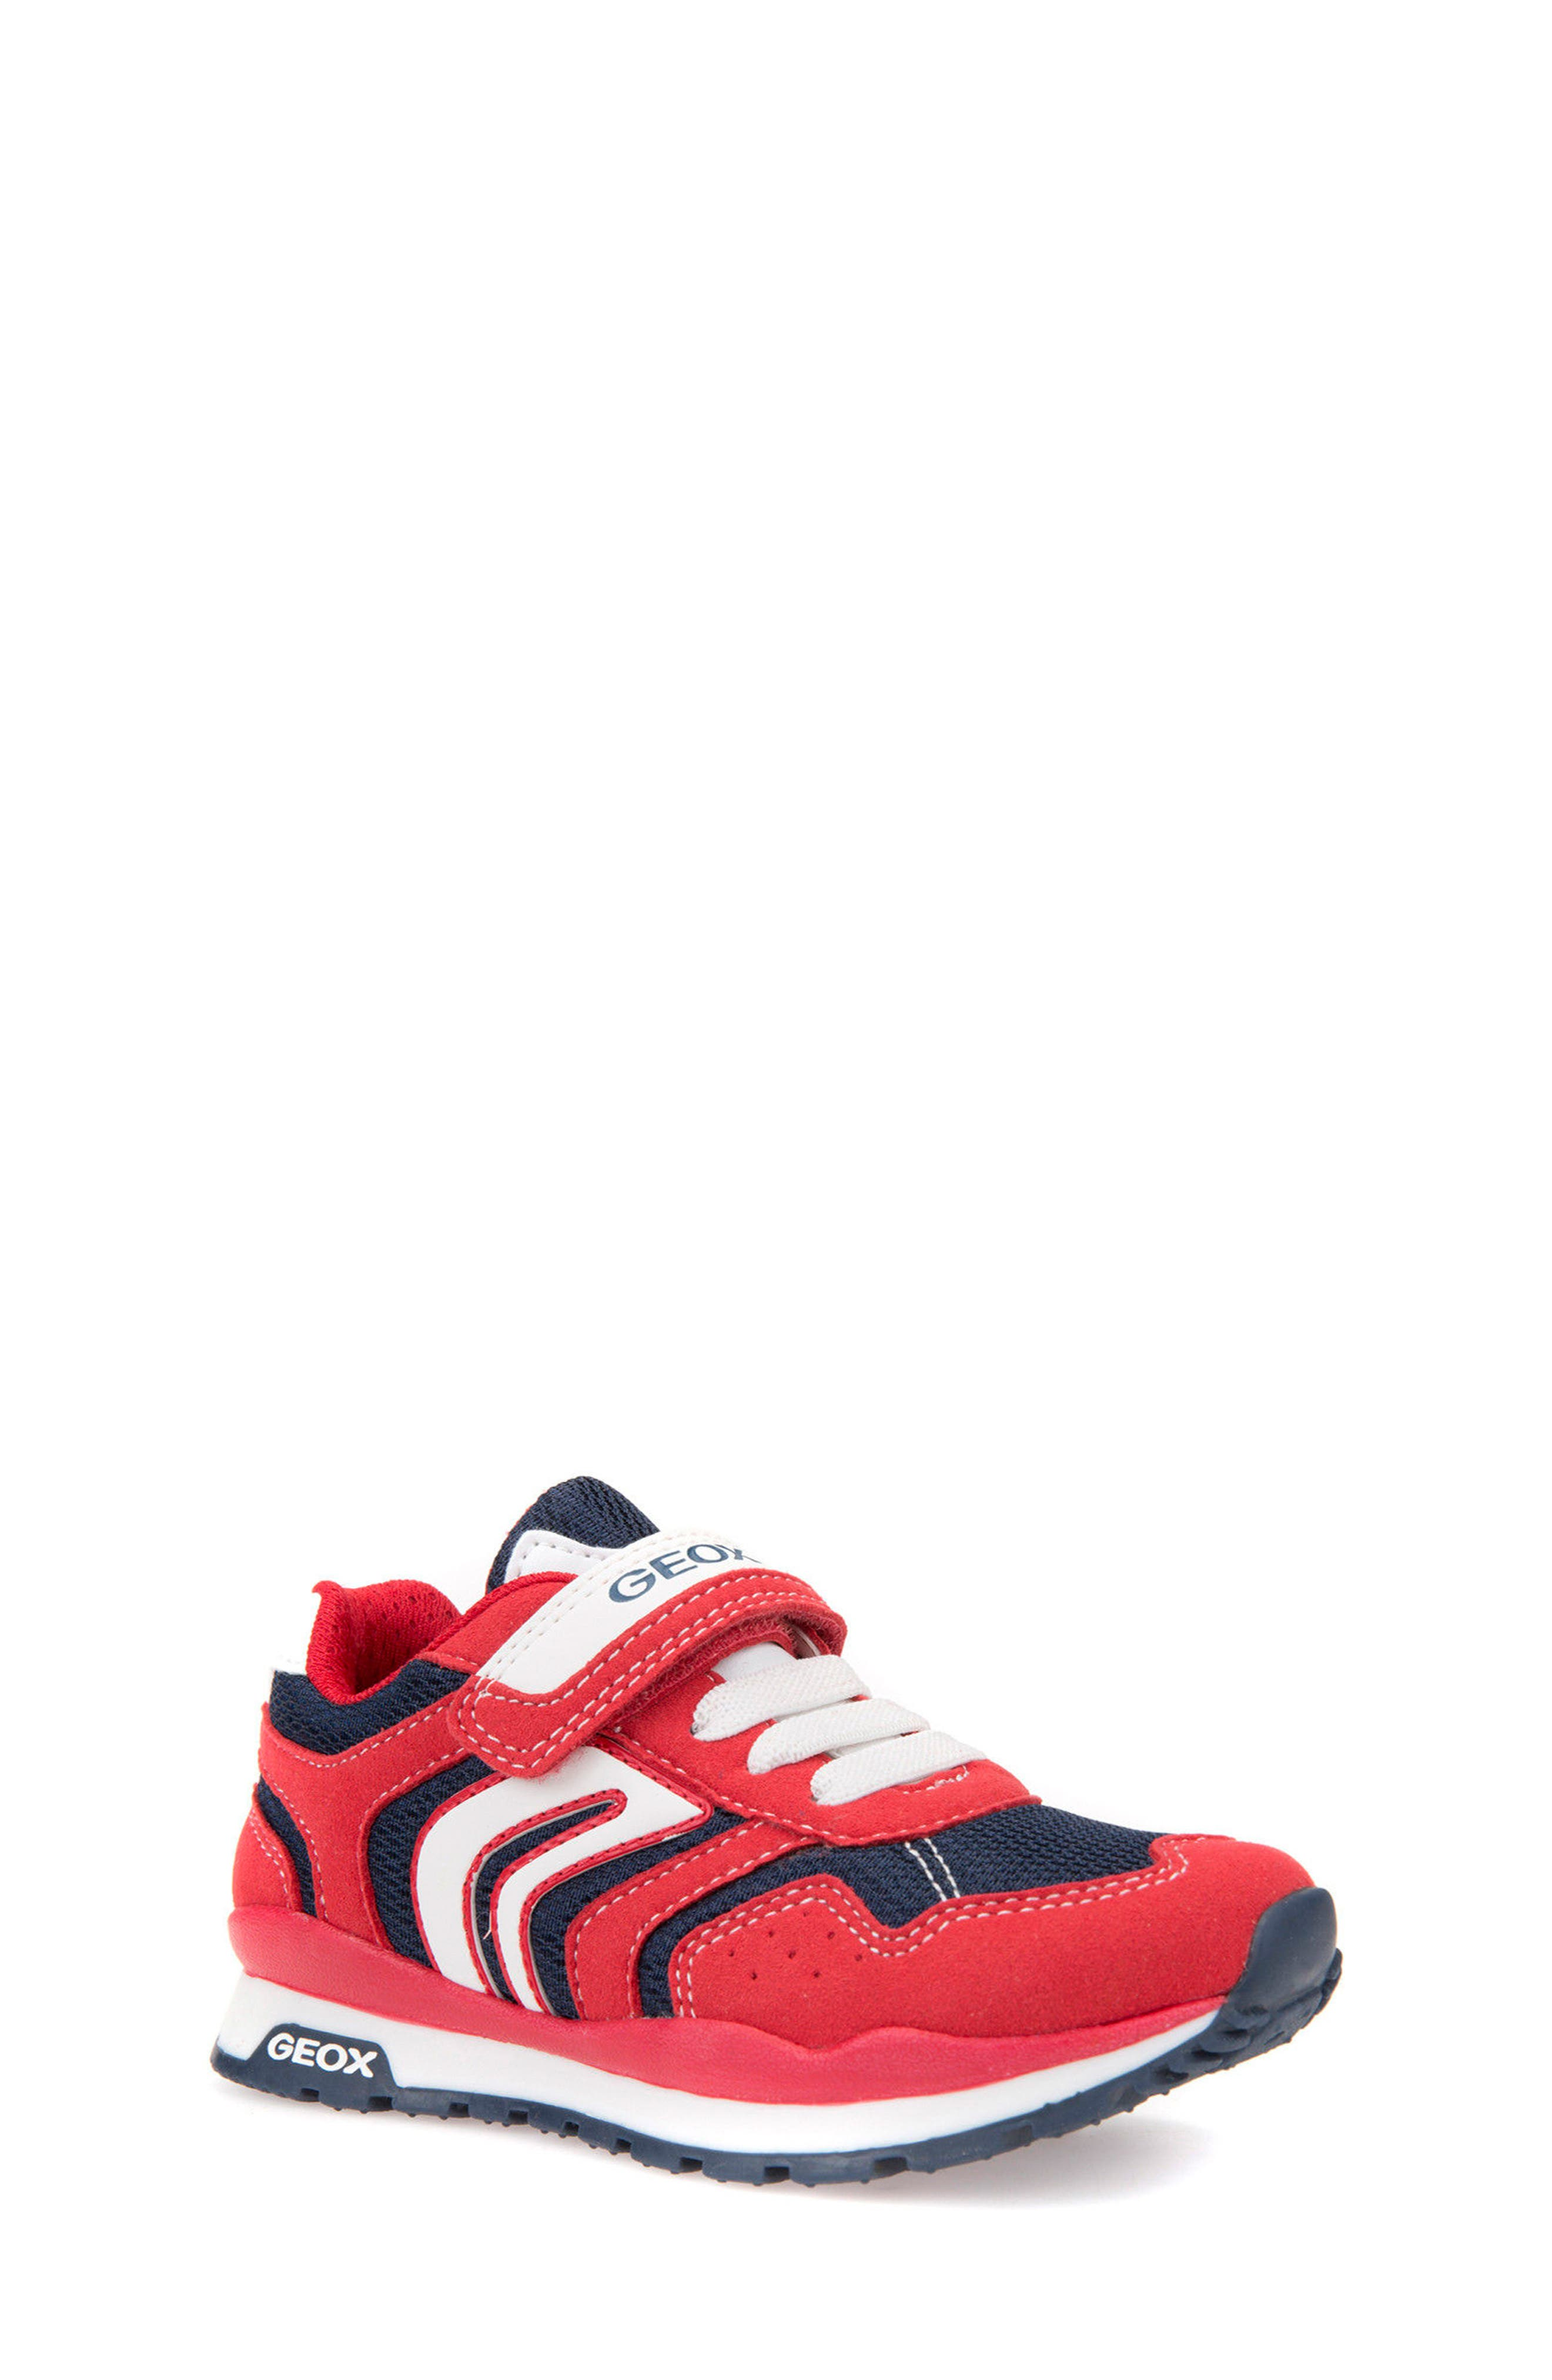 Geox Pavel Low Top Sneaker (Toddler, Little Kid & Big Kid)